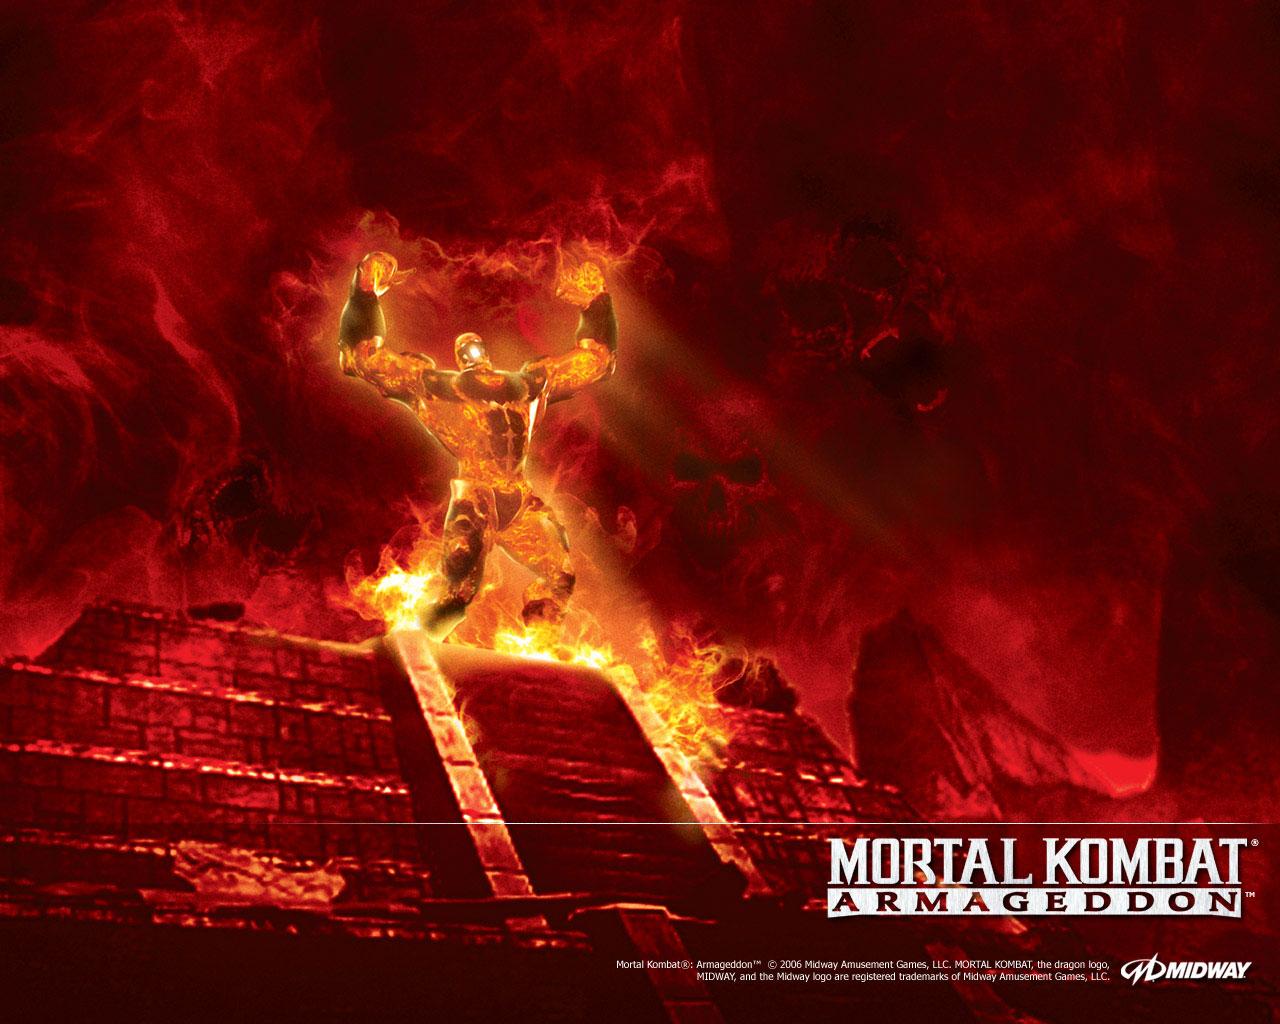 totalmortalkombat.com :: Mortal Kombat: Armageddon - Wallpaper